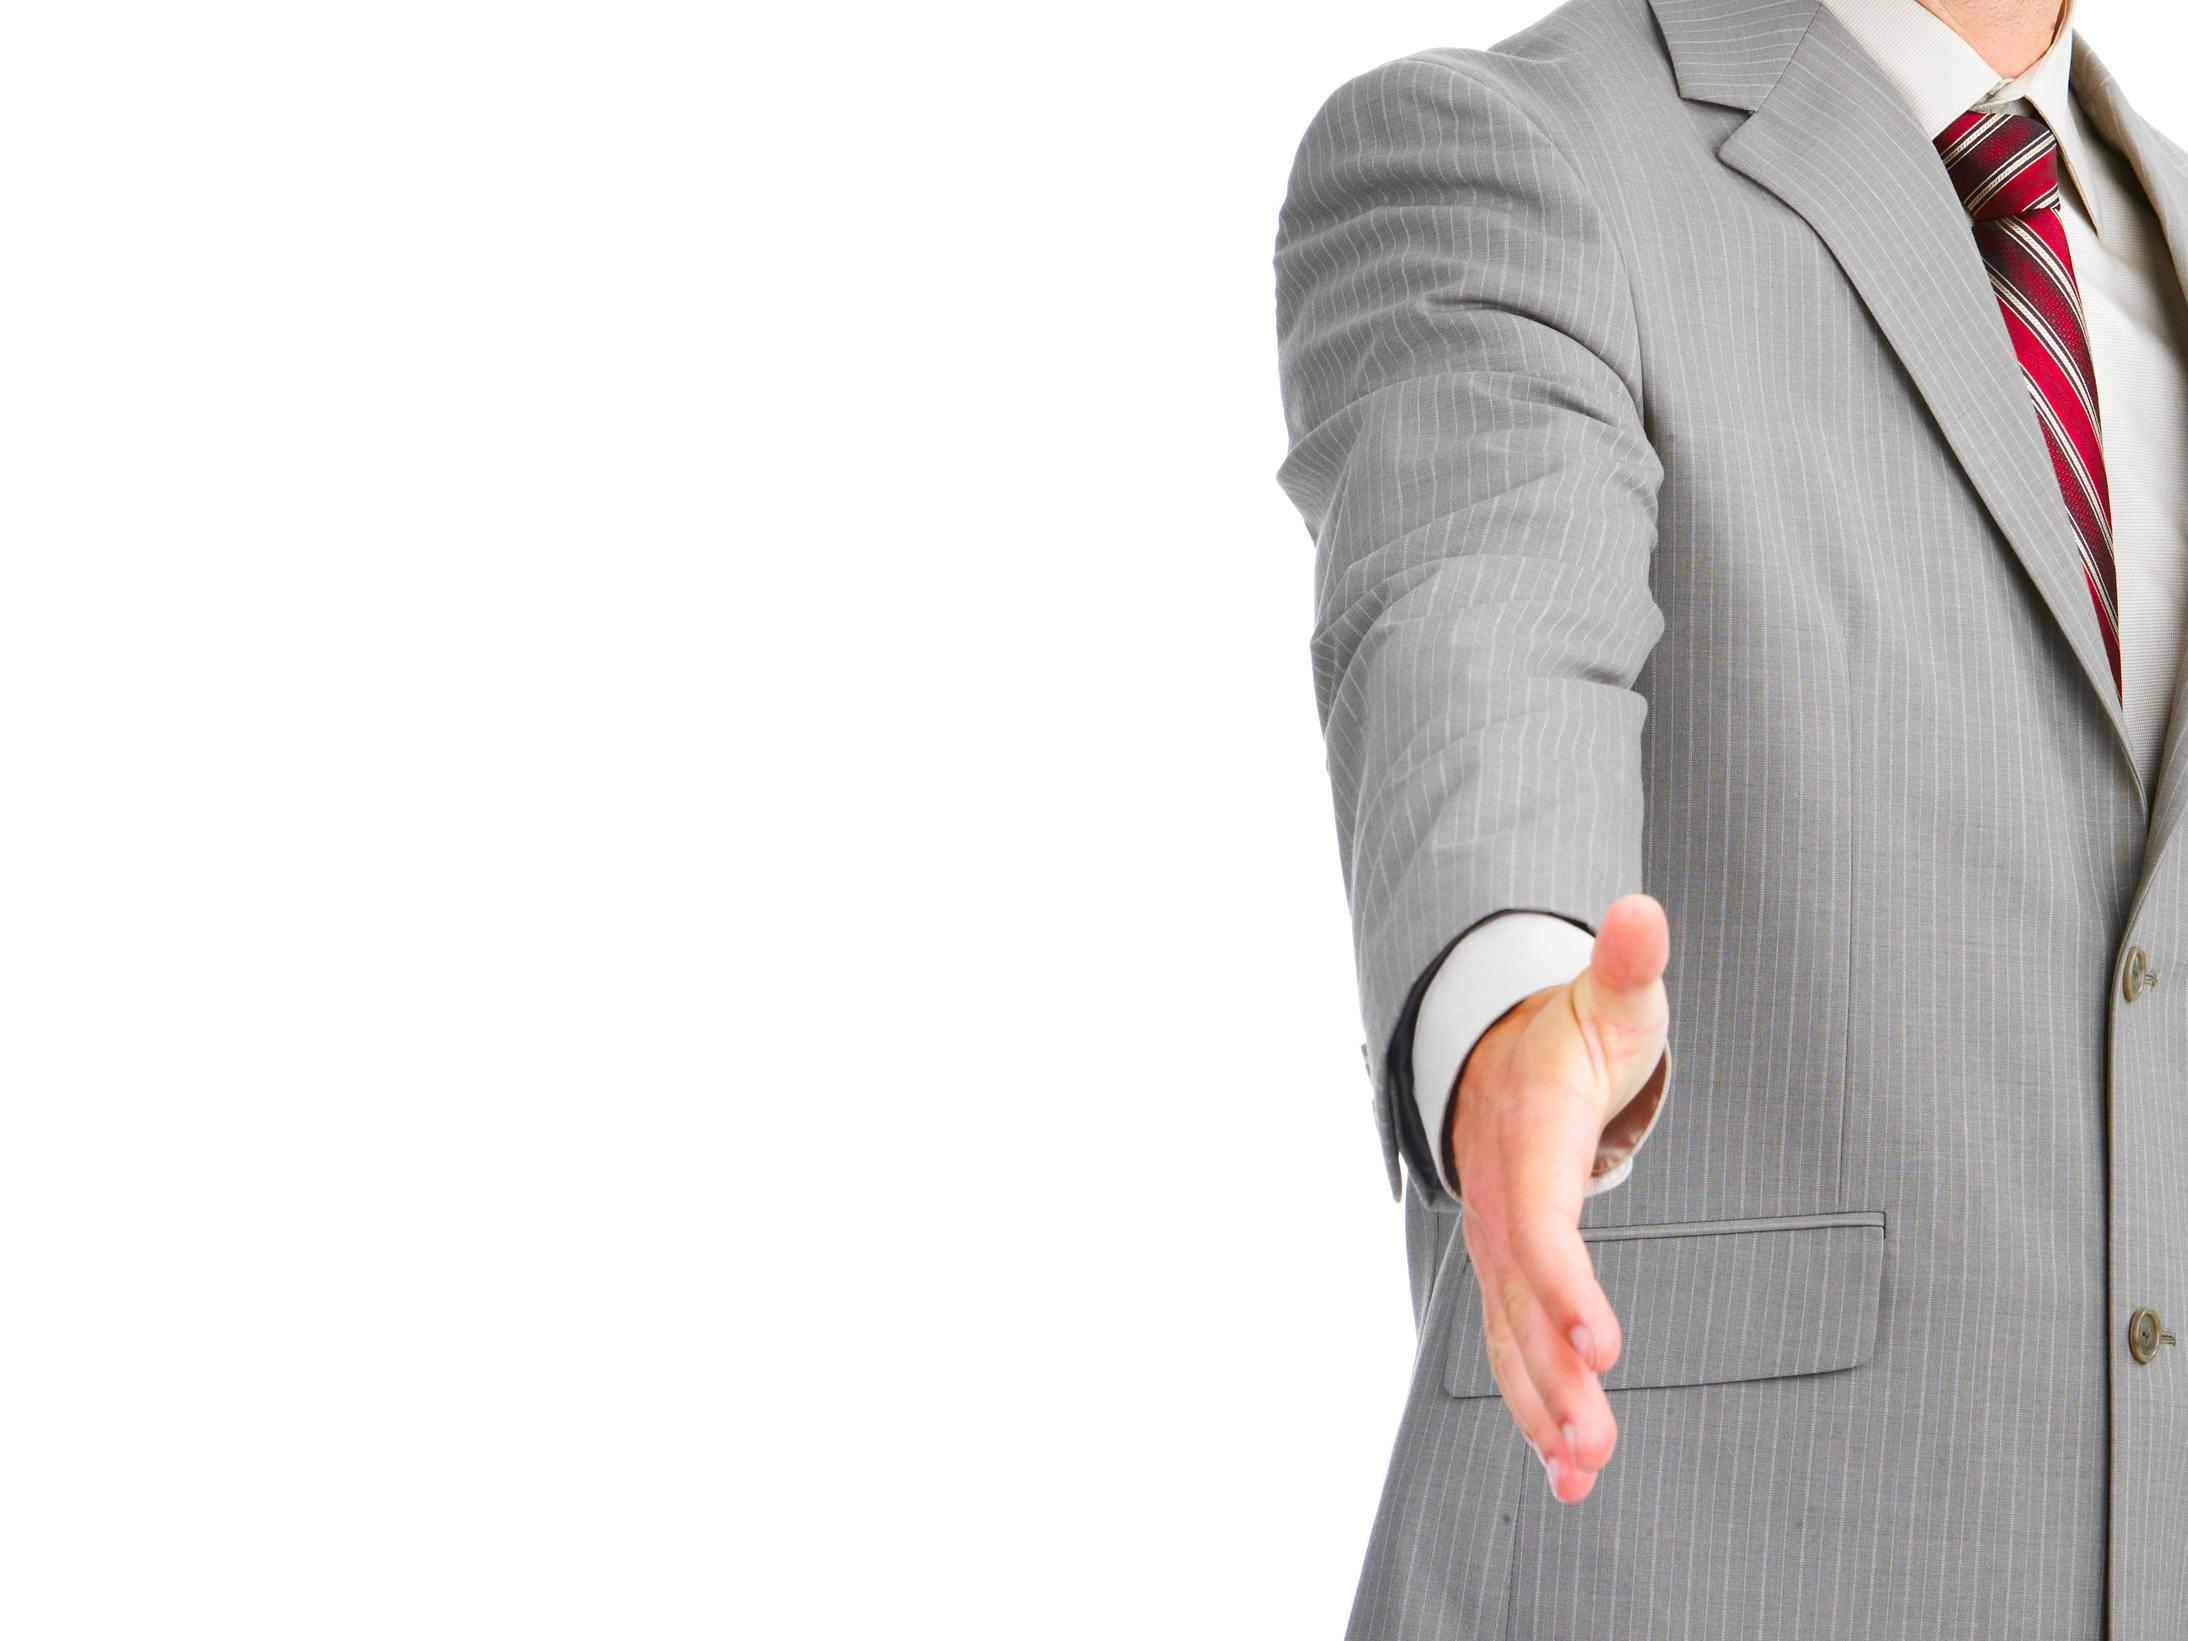 Salesman-handshake.jpg